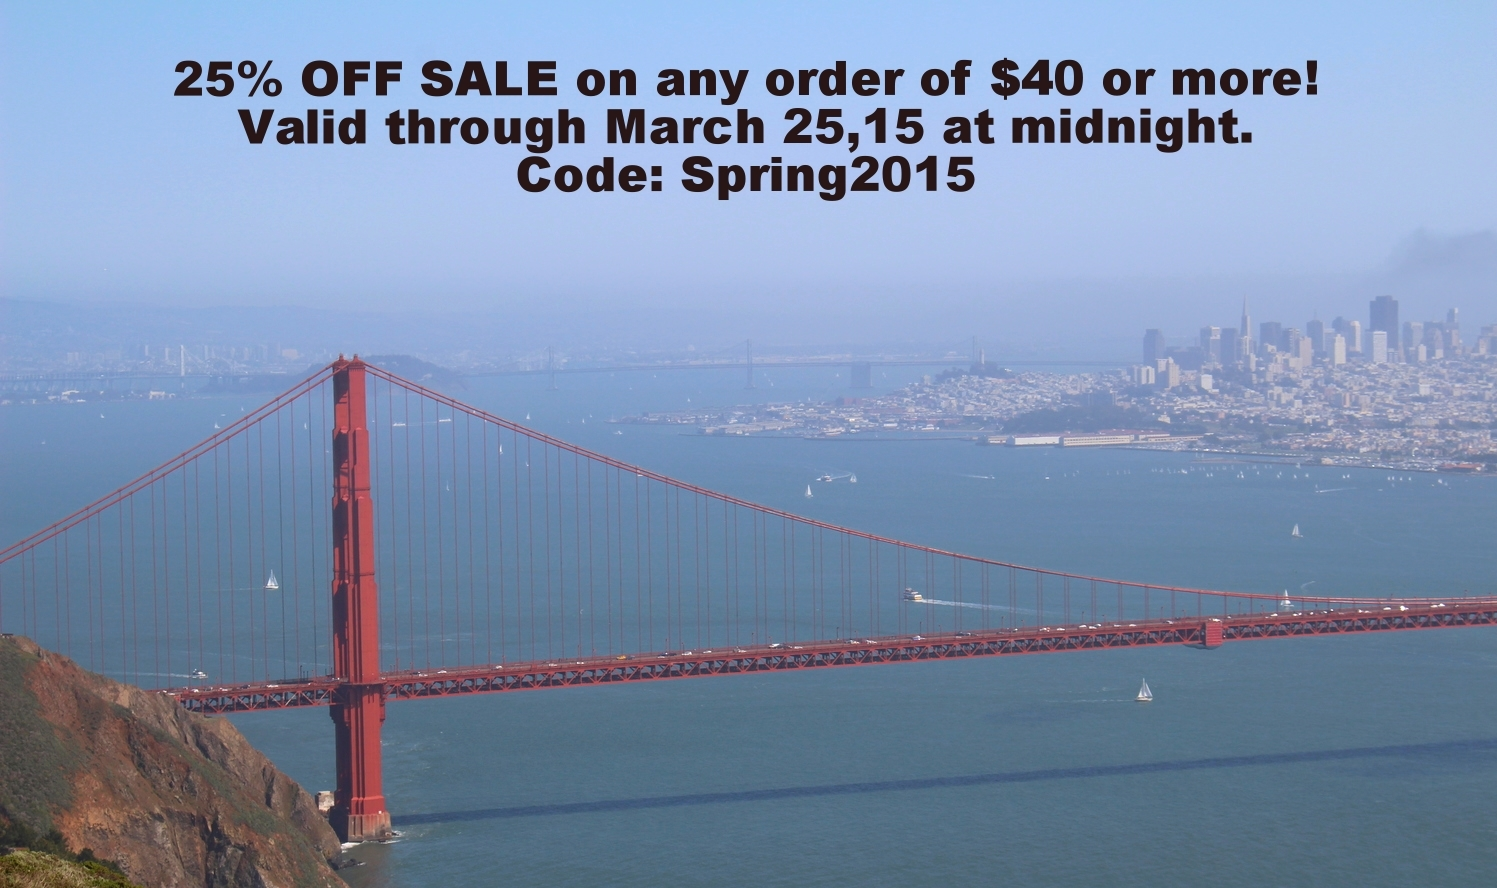 Original picture taken of Golden Gate bridge